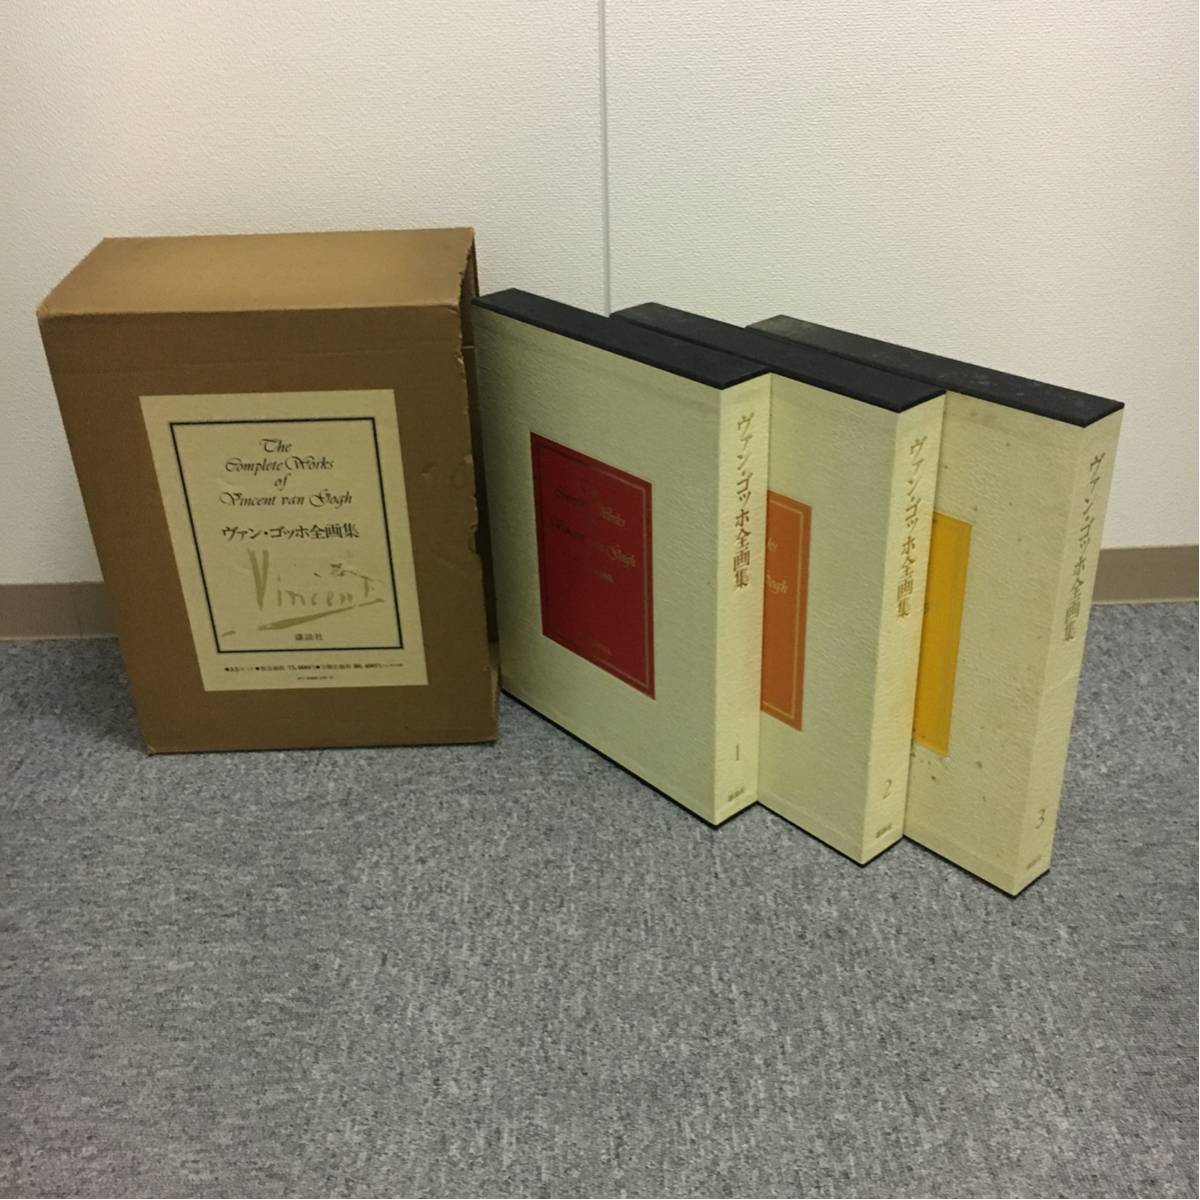 昭和53年「ヴァン・ゴッホ全画集」3巻揃 講談社 定価七万五千円